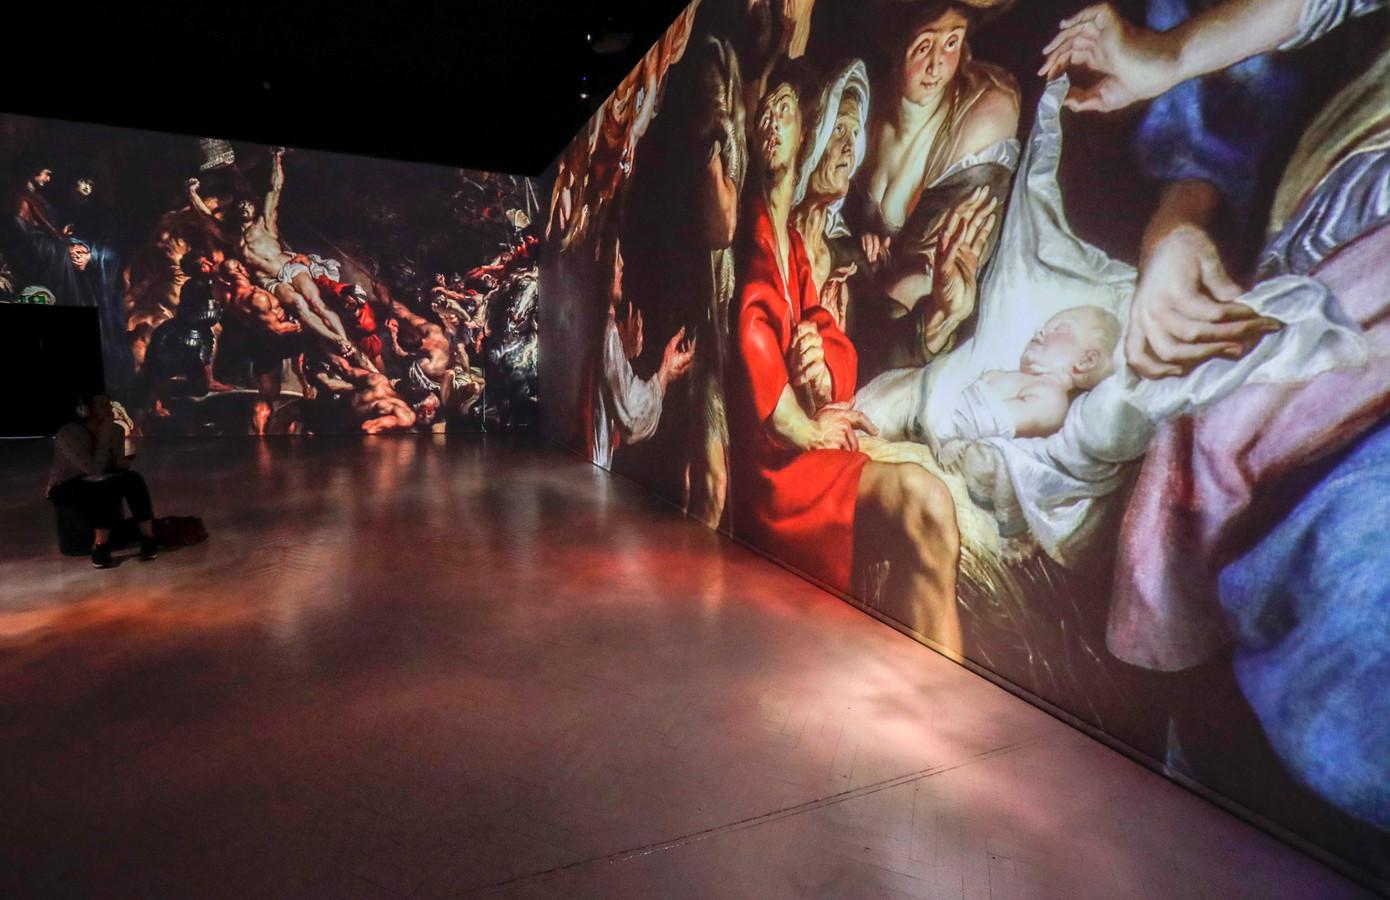 """Meet the Masters"" offre un voyage à 360° dans les œuvres de Jan Van Eyck, Pieter Bruegel et Peter Paul Rubens"